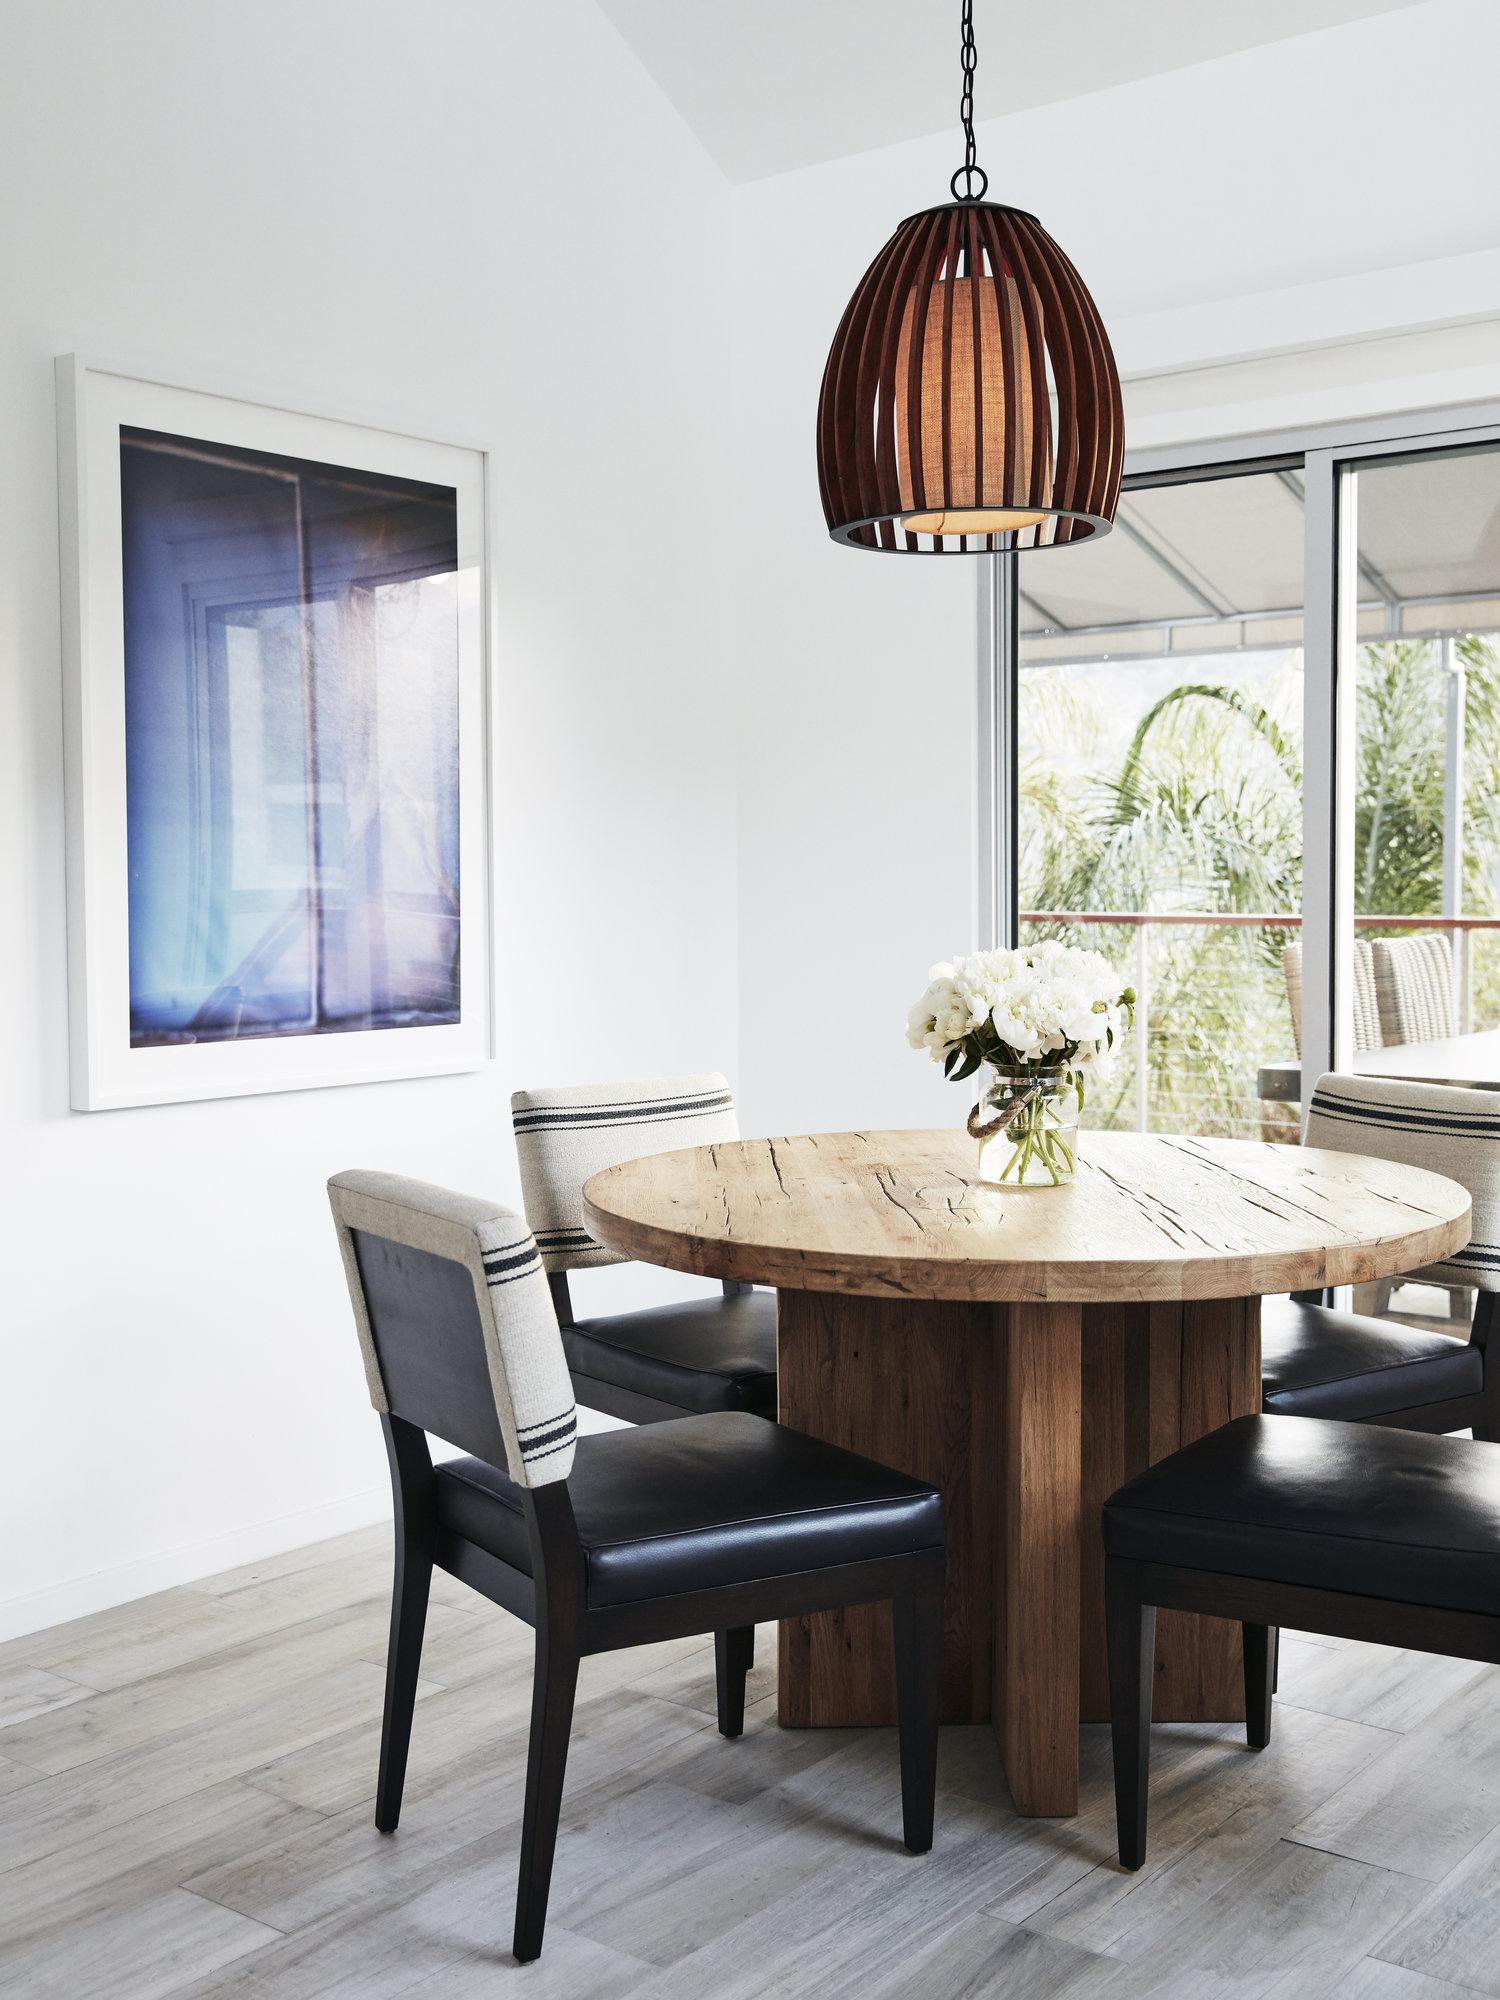 Home+for+sale+in+Montecito+Santa+Barbara+California+contemporary+homes+modern+homes+ikea+home+inspiration+36+Canon+View+Riskin+Partners.jpeg